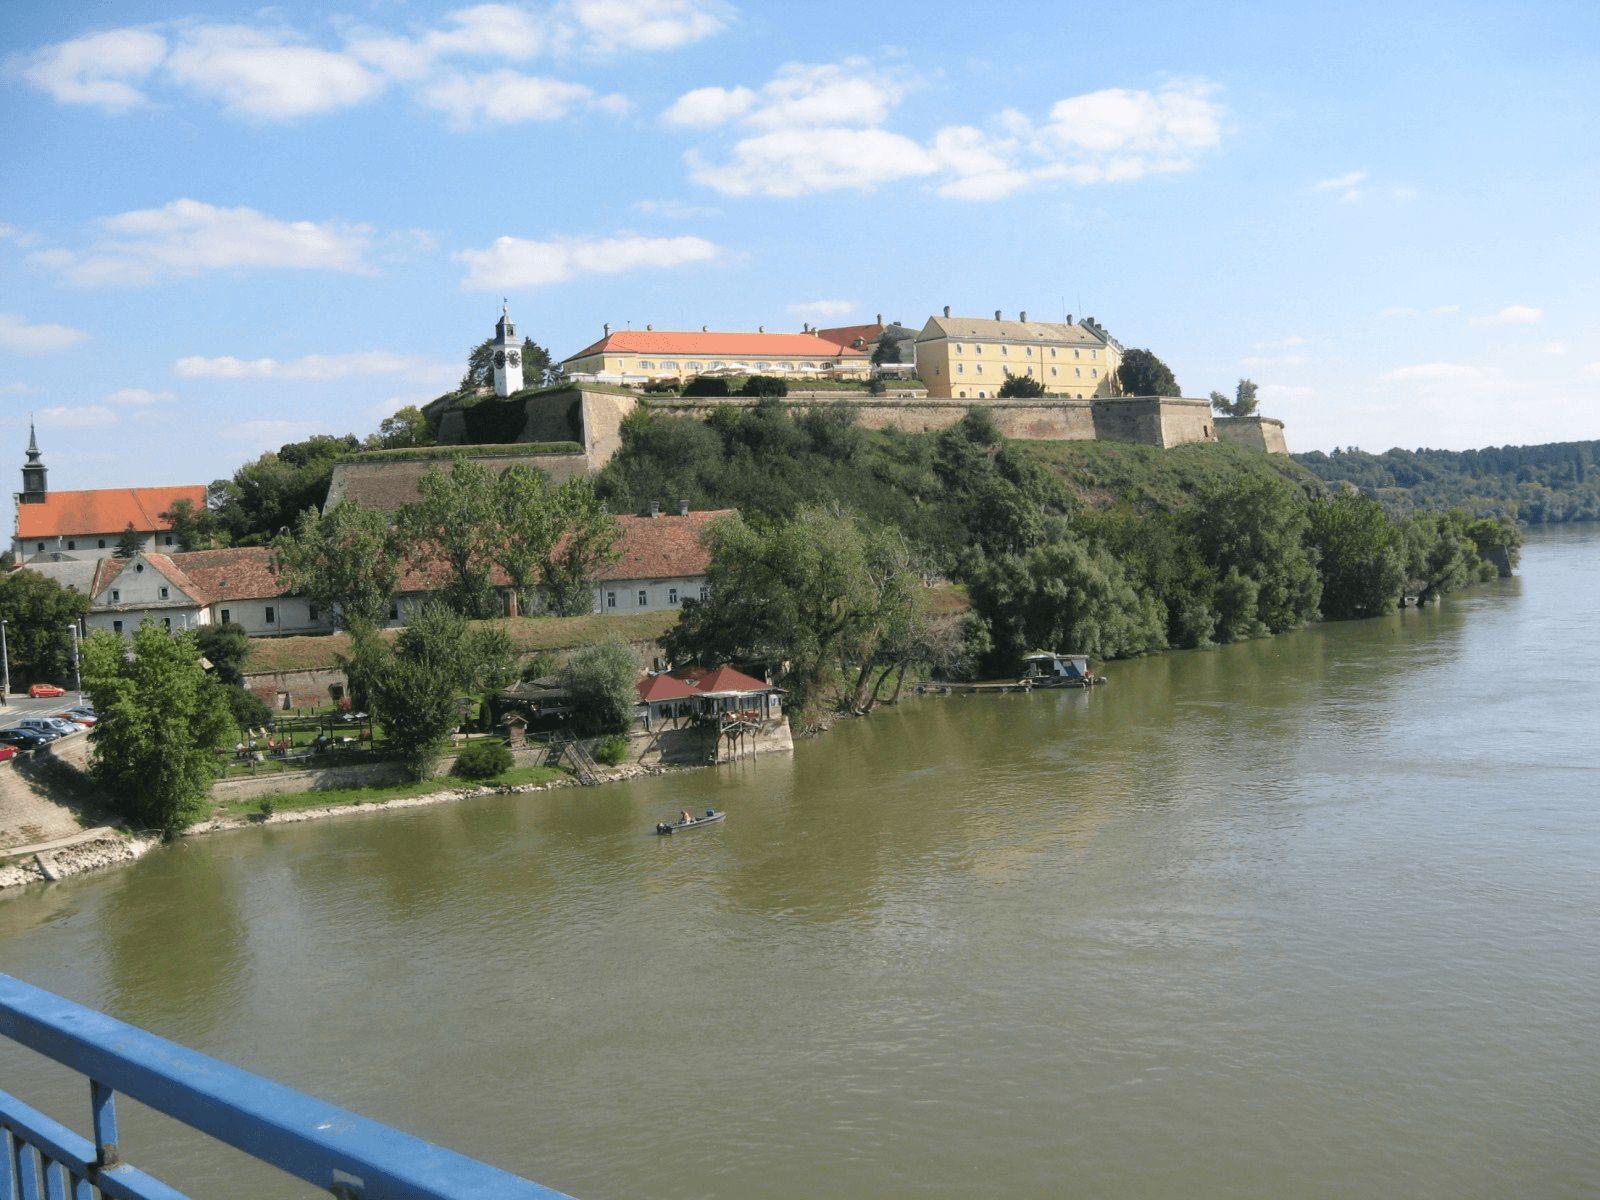 Beograd i Vojvodina: Petrovaradinska tvrđava